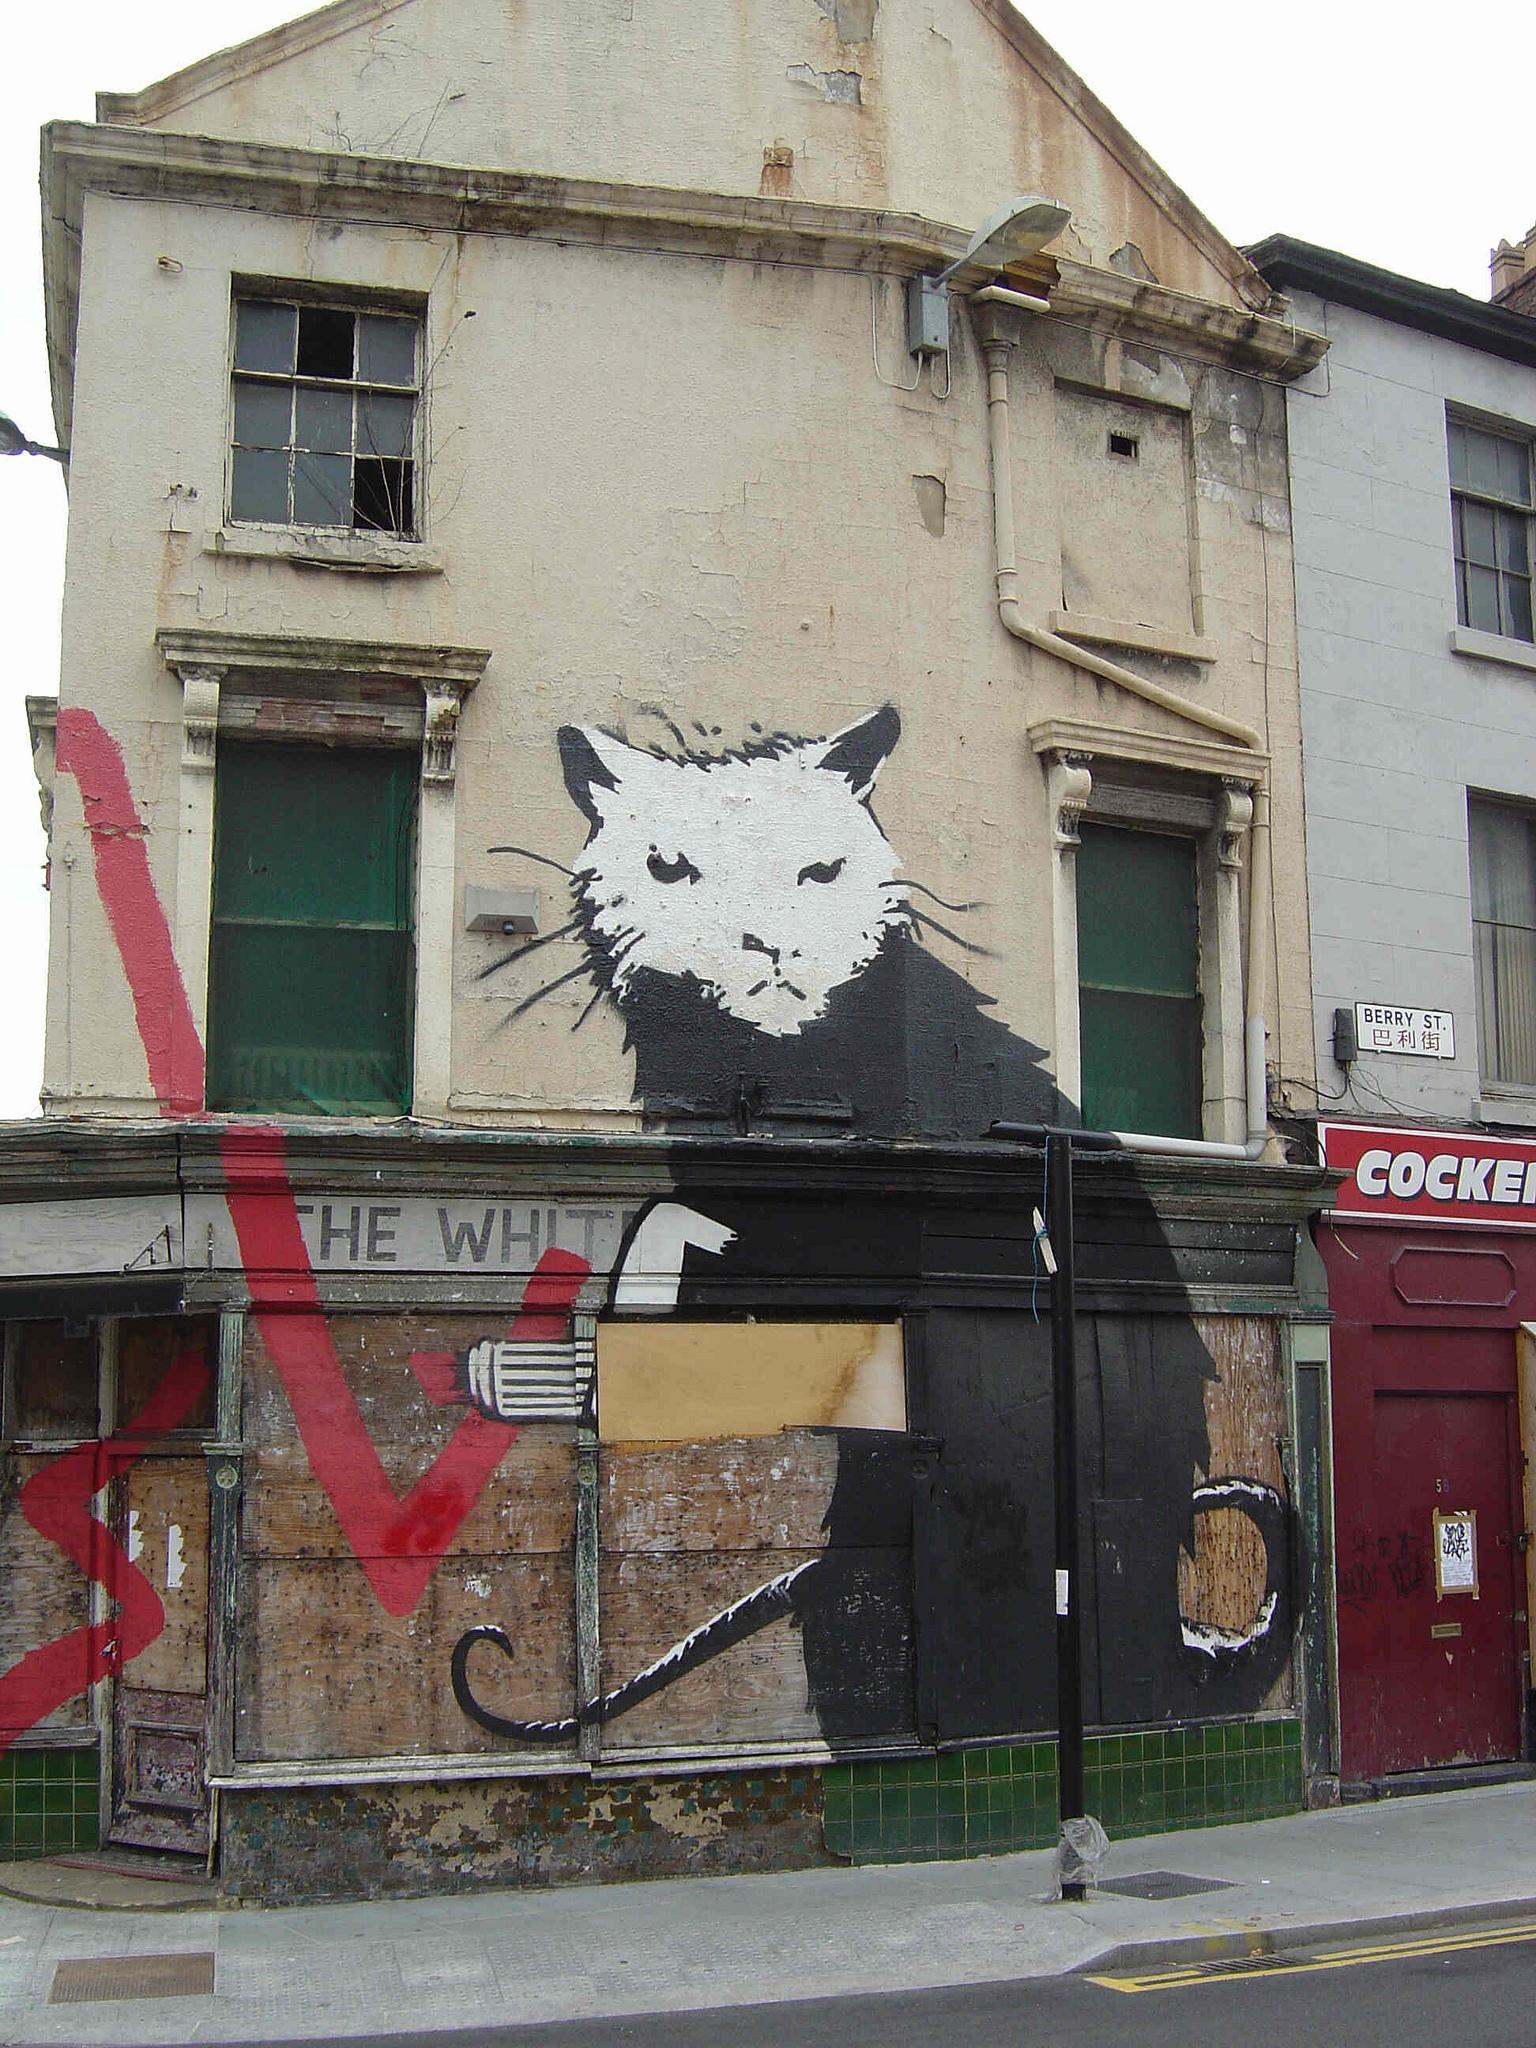 Artwork in Liverpool by Banksy.